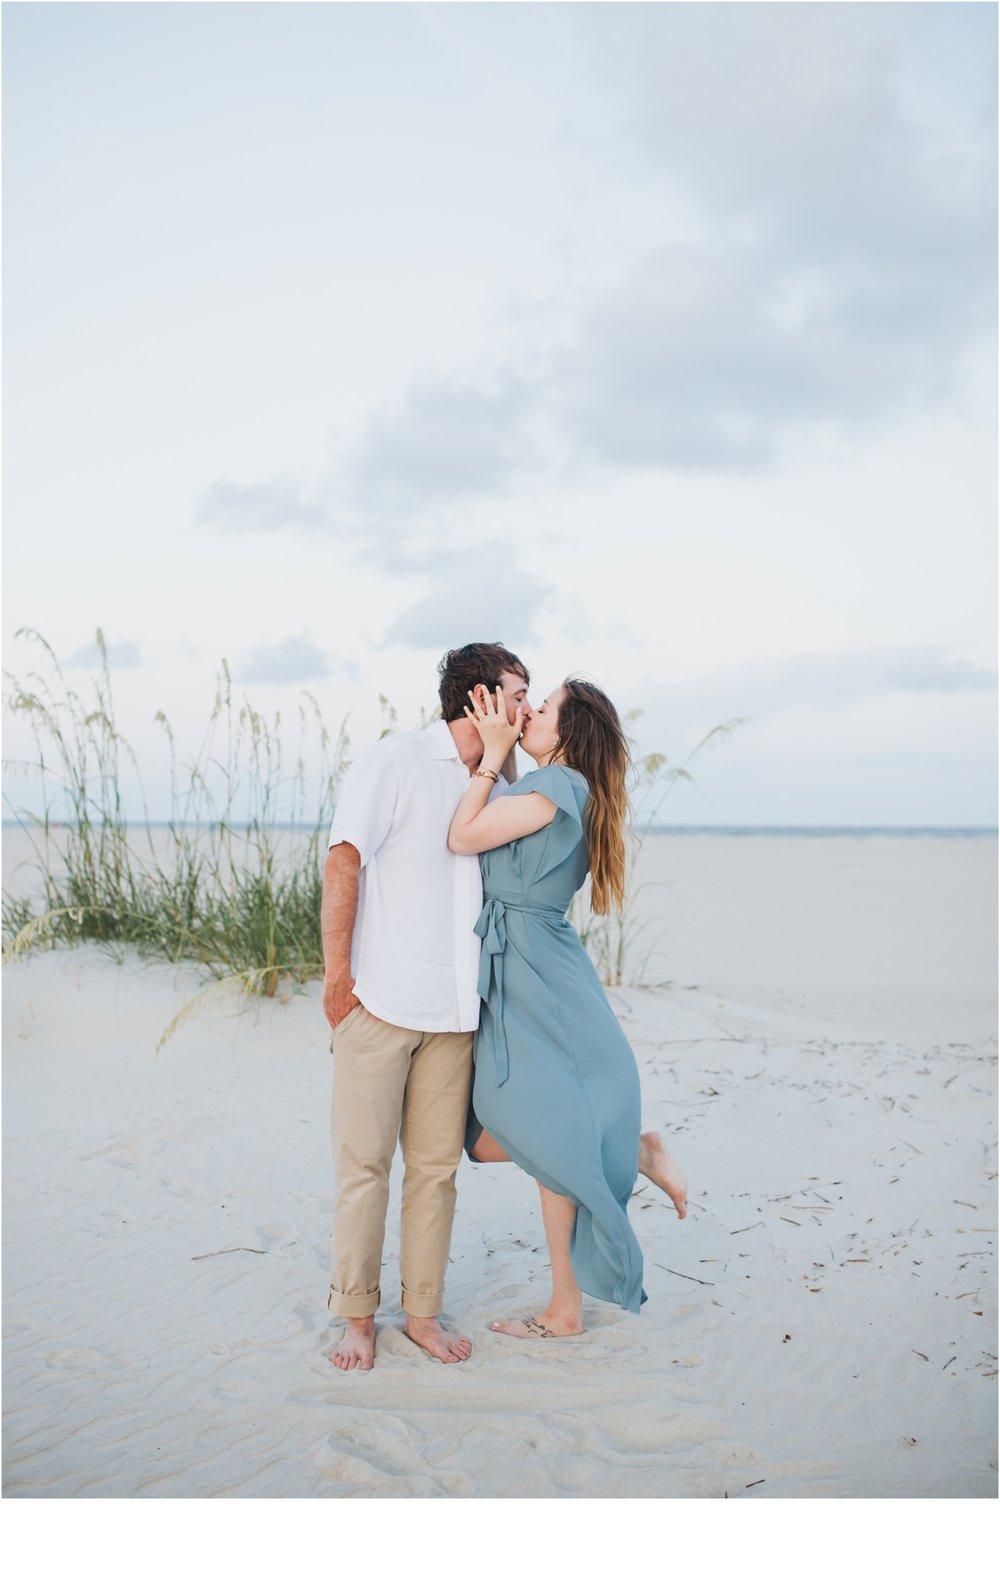 Rainey_Gregg_Photography_St._Simons_Island_Georgia_California_Wedding_Portrait_Photography_1176.jpg